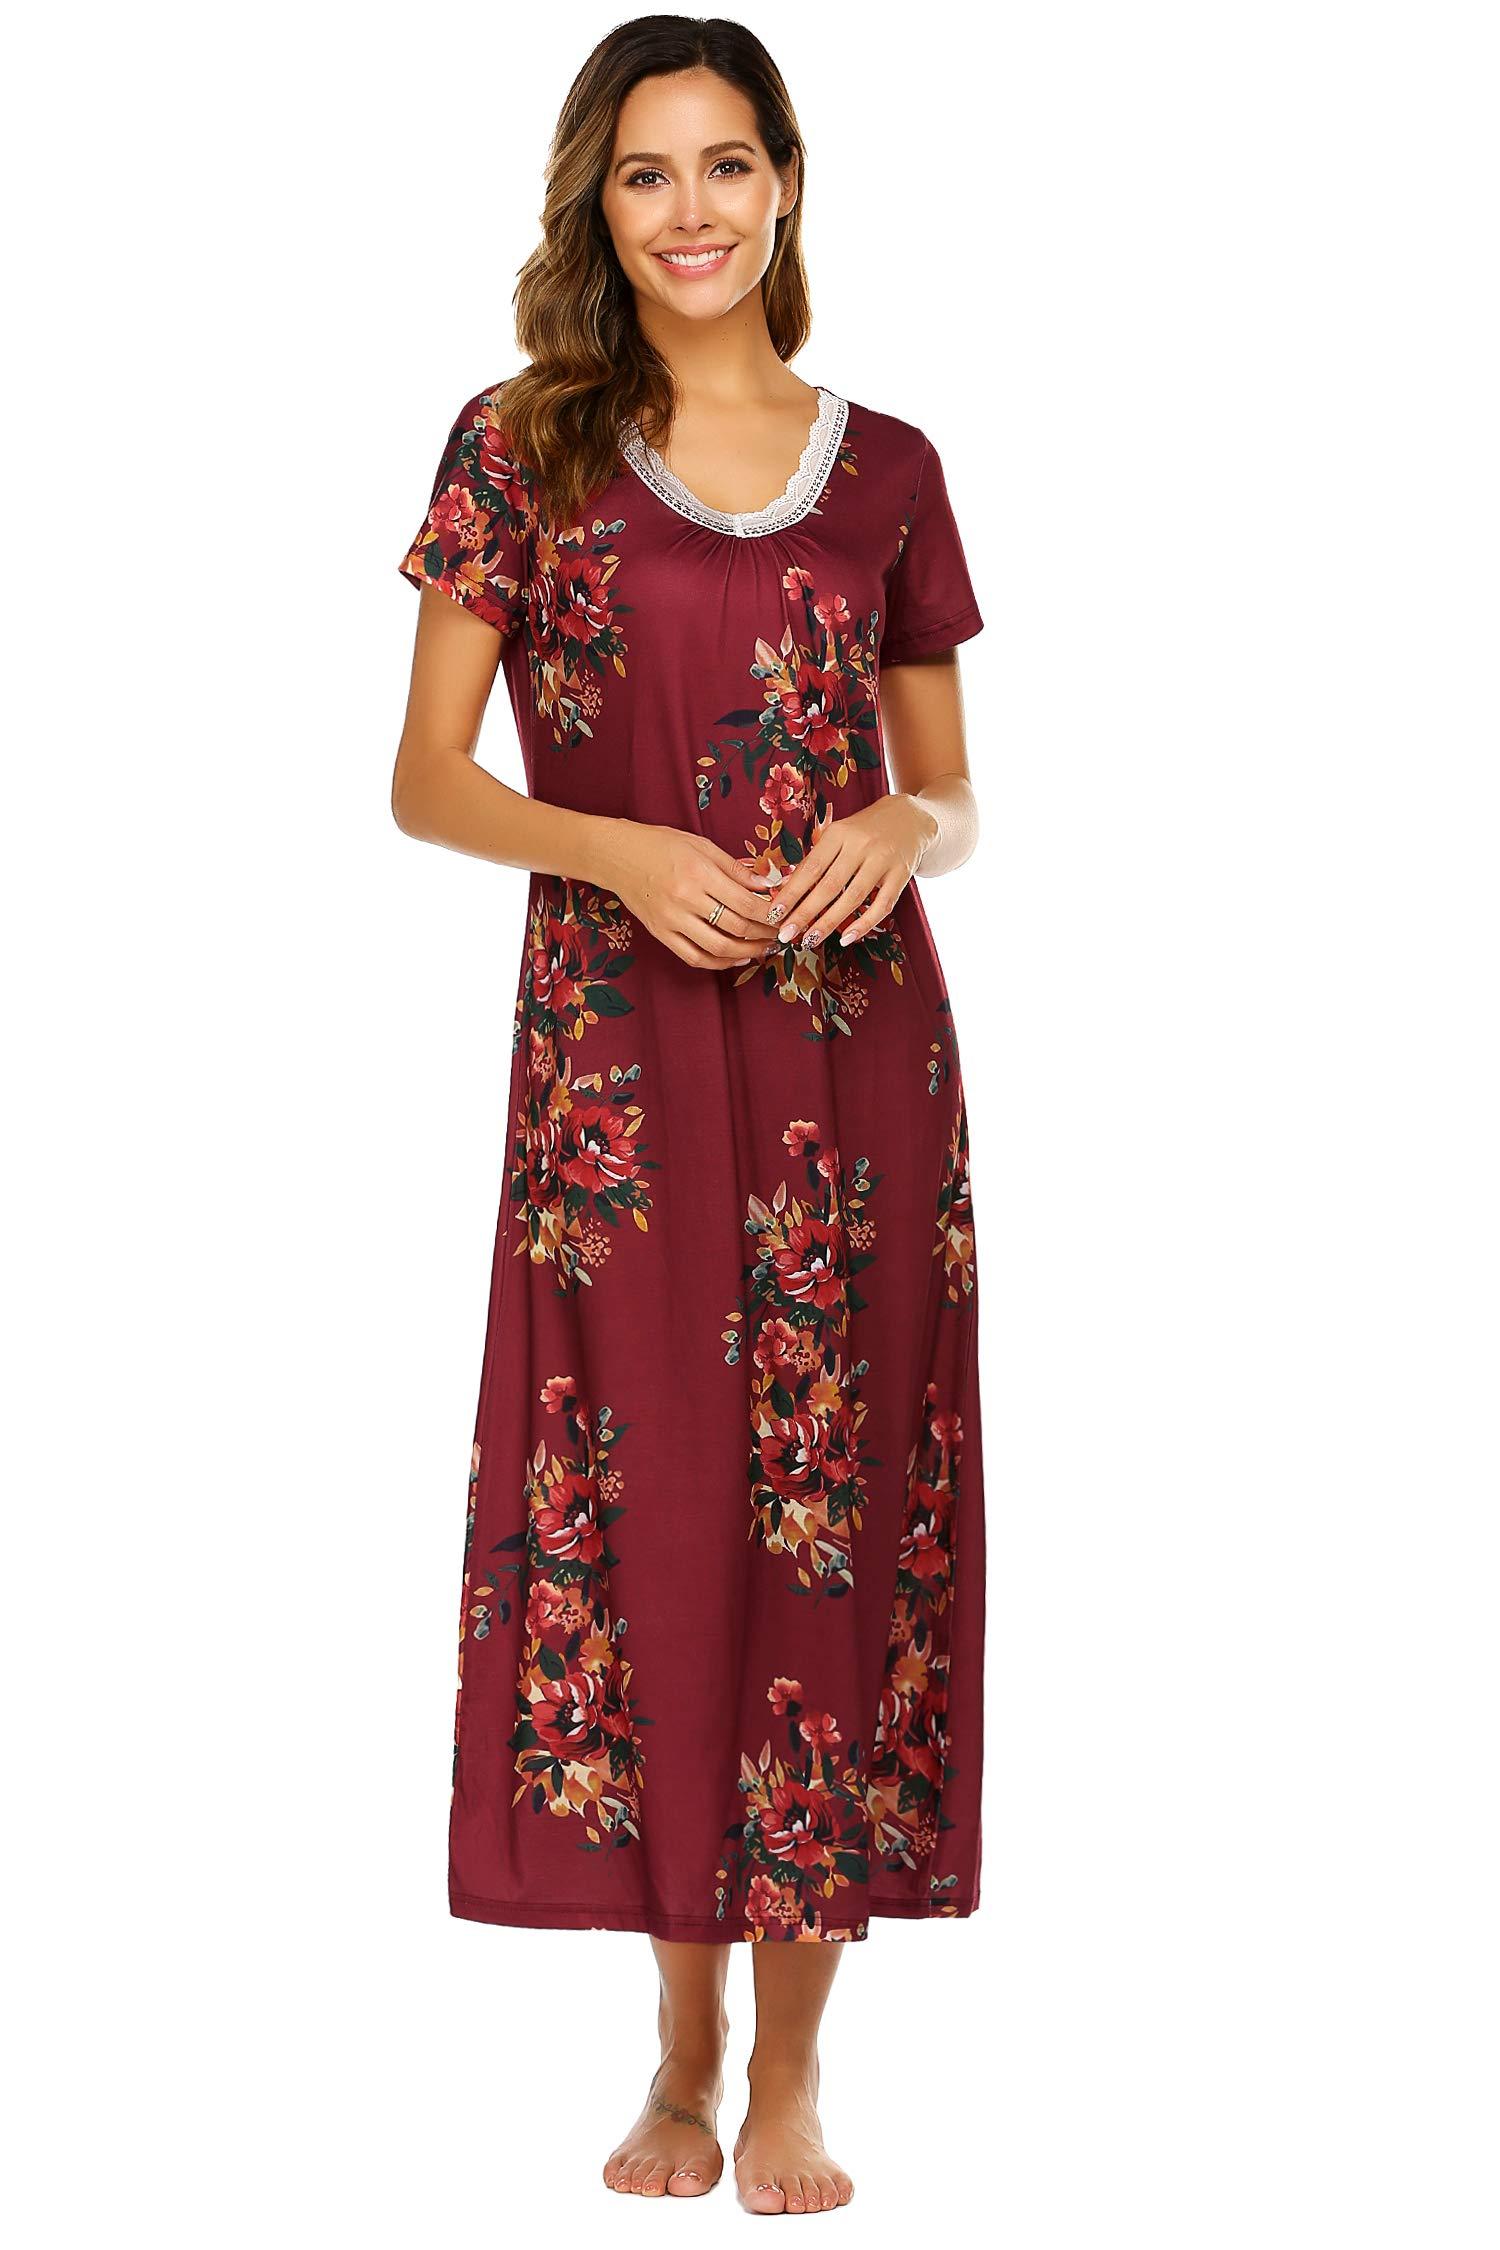 Ekouaer Women Nightgown Lounger Floral Printed House Dress for Women Sleepwear